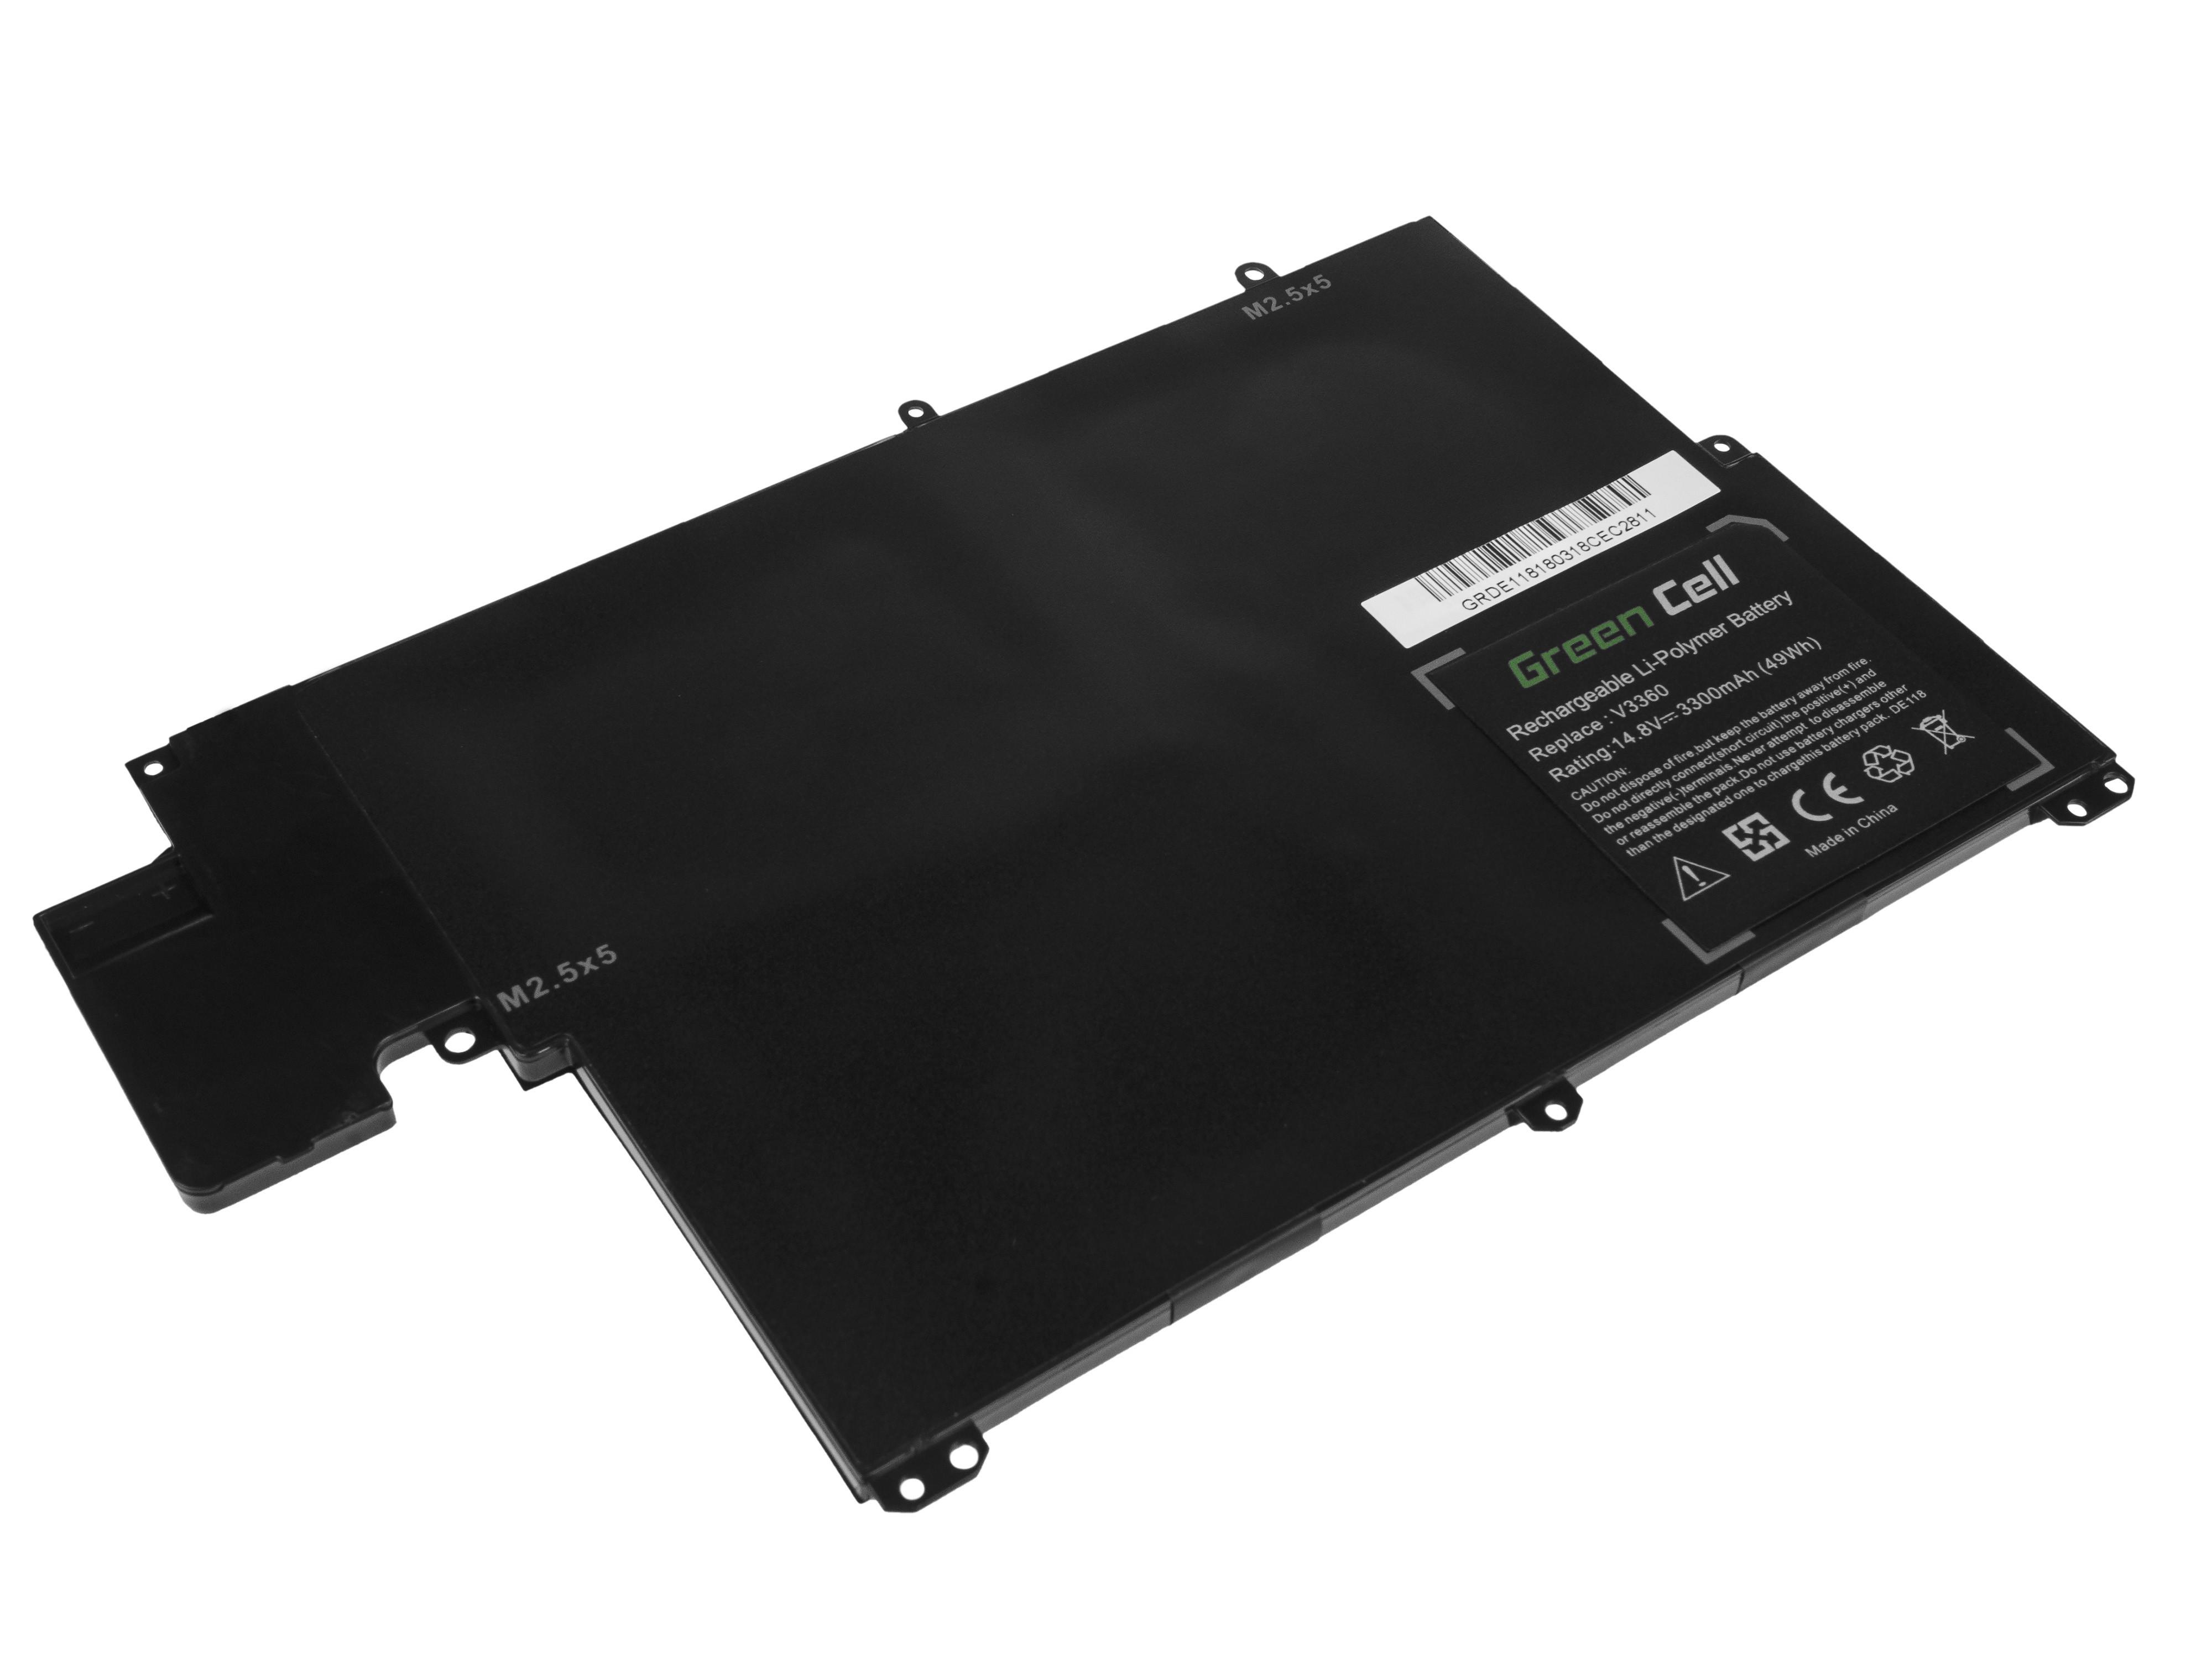 Green Cell DE118 Baterie Dell Vostro 3360/Inspiron 13z 5323/TKN25 3300mAh Li-Pol – neoriginální